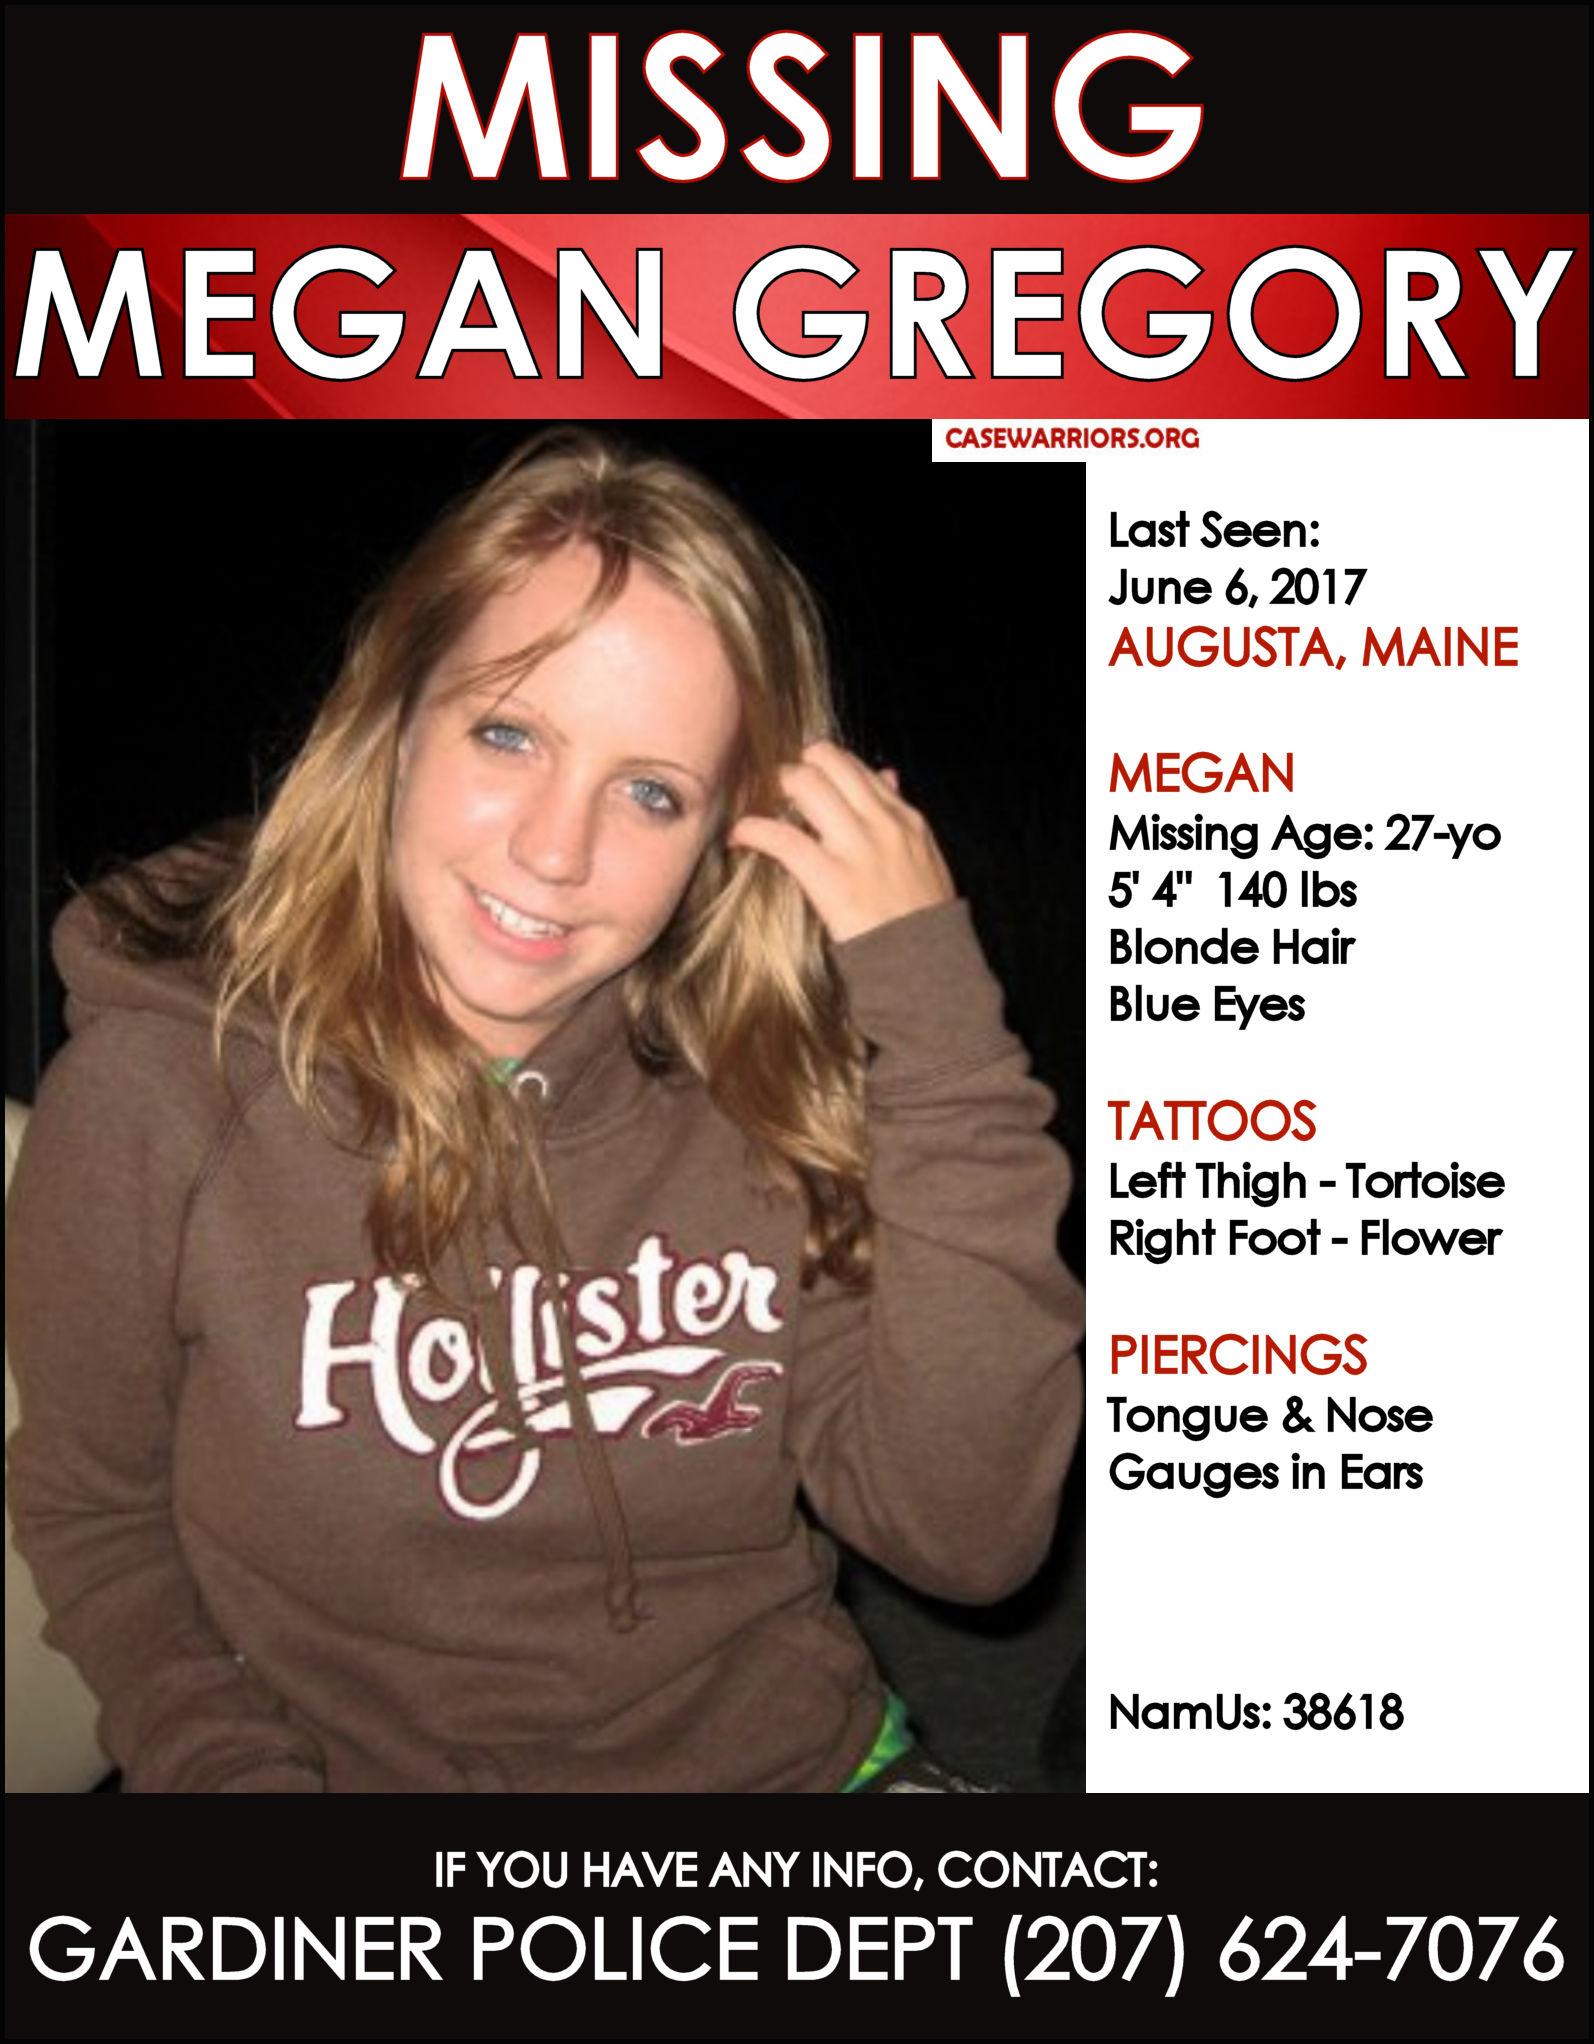 MEGAN GREGORY